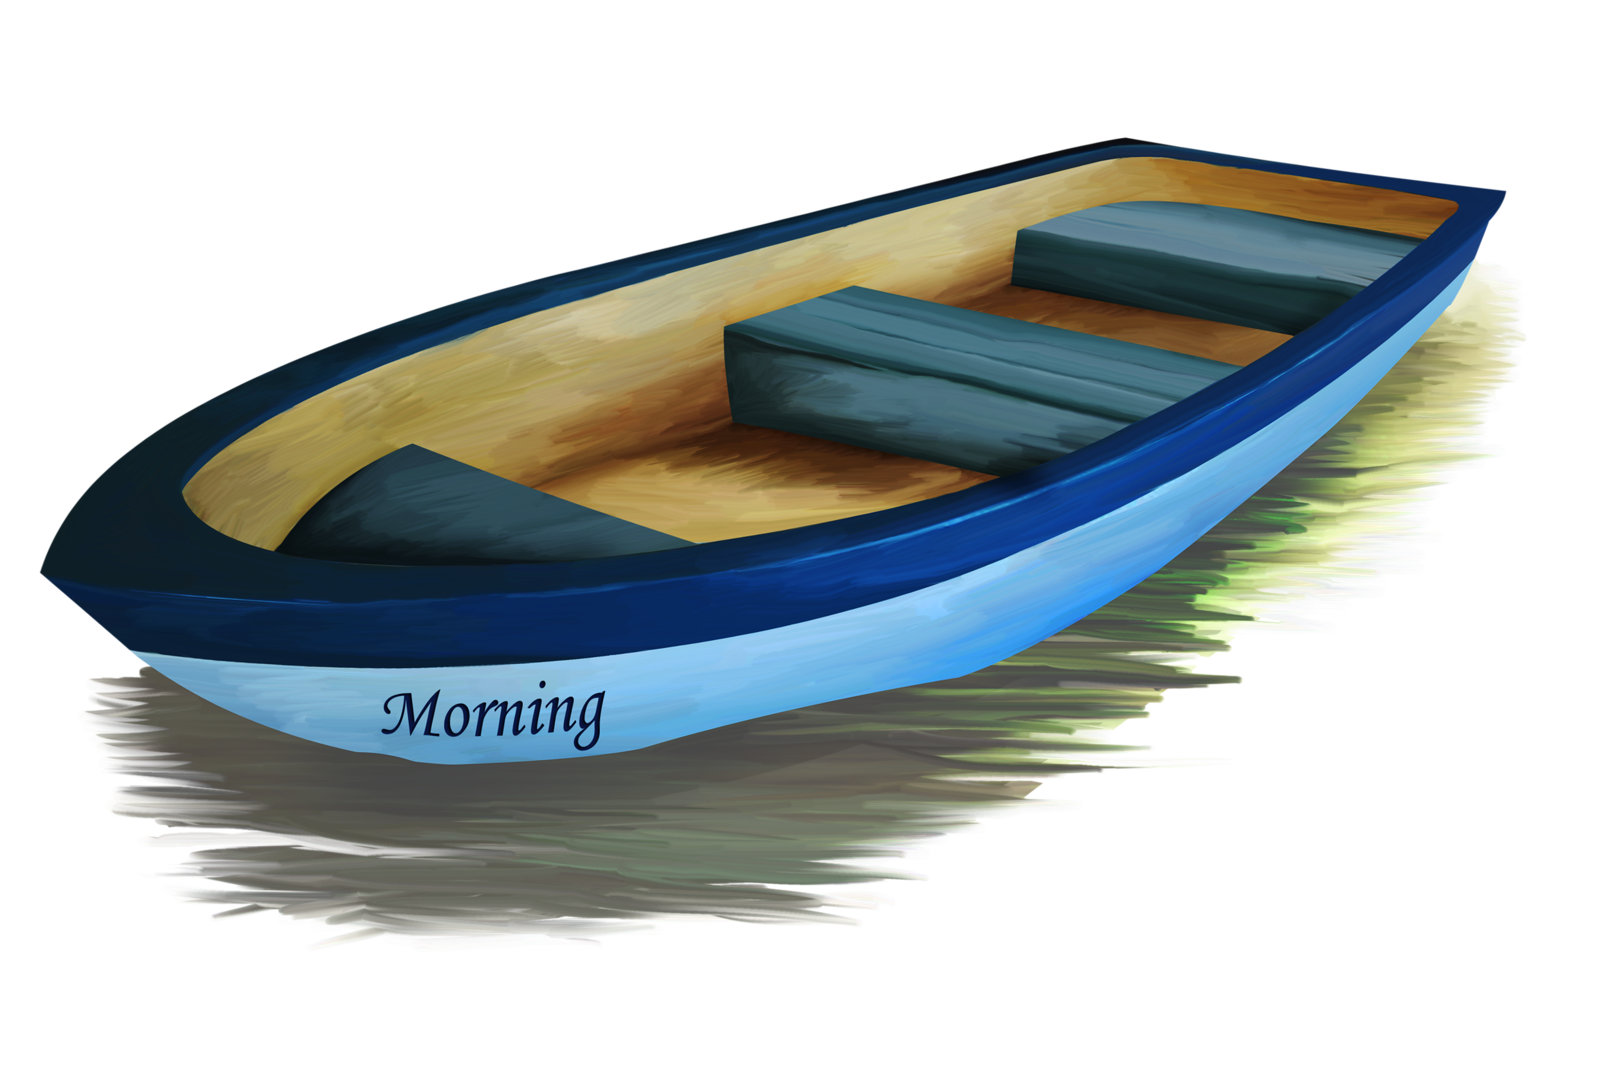 Transportation clipart canoe. Angi designs dreams of